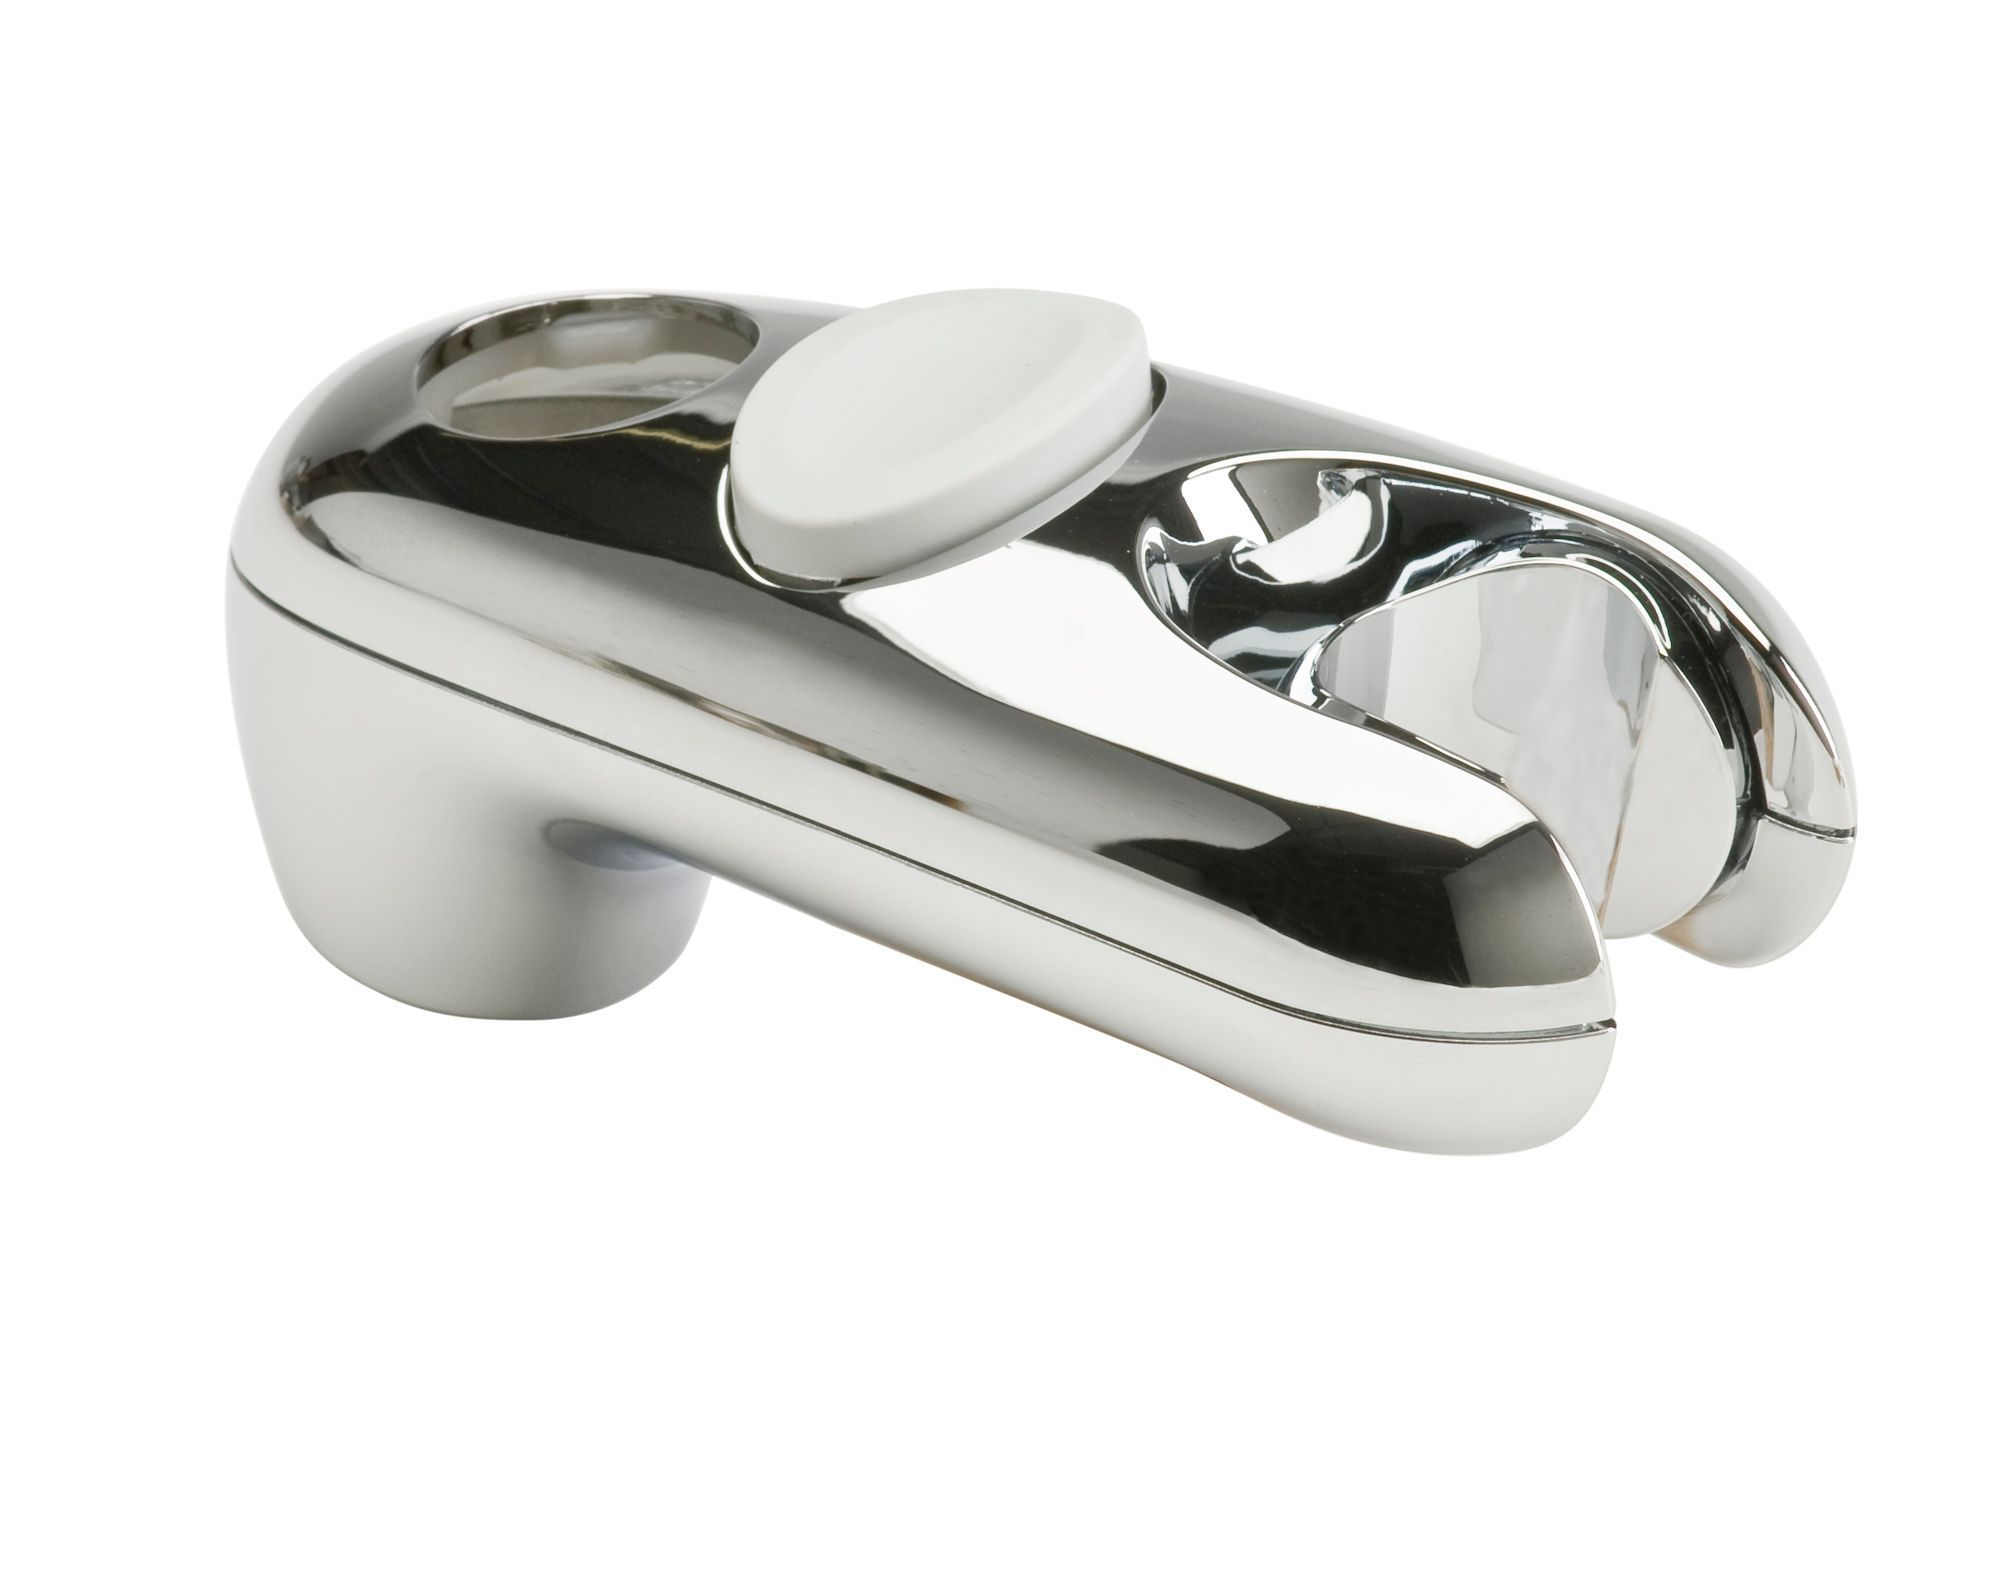 Mira Silver Shower Head Holder With Riser Rail Attachment